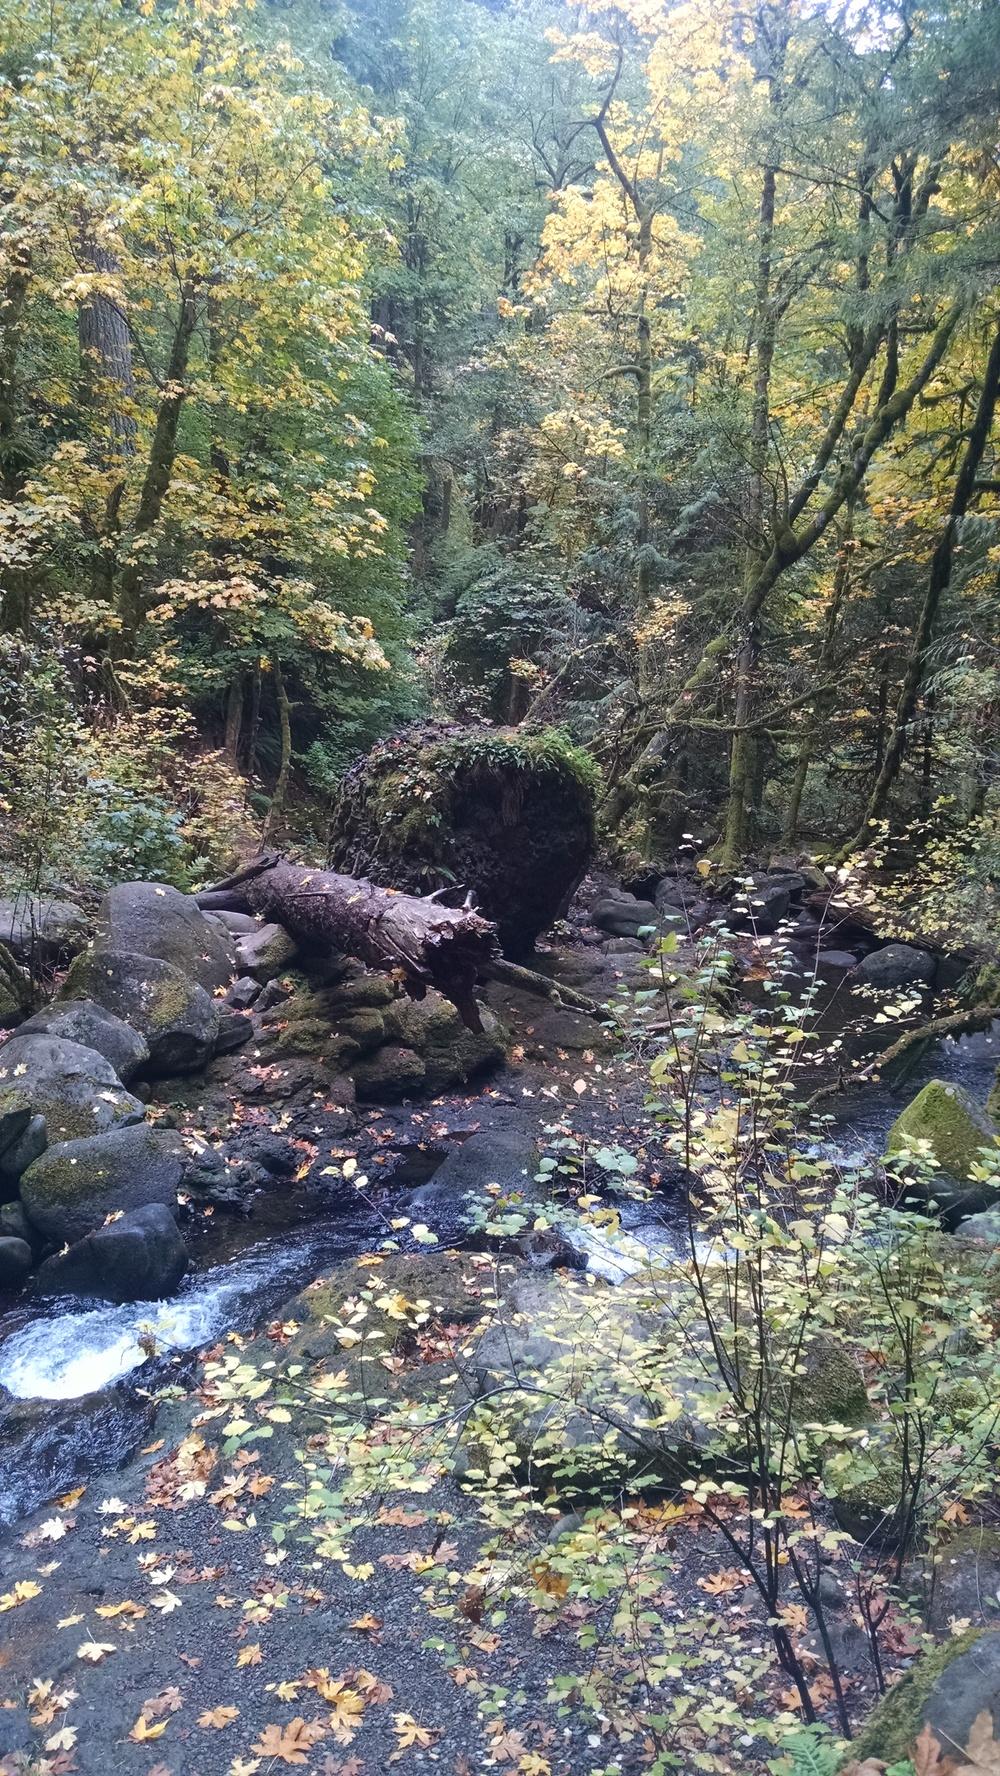 Maltnomah Falls, Portland, Oregon